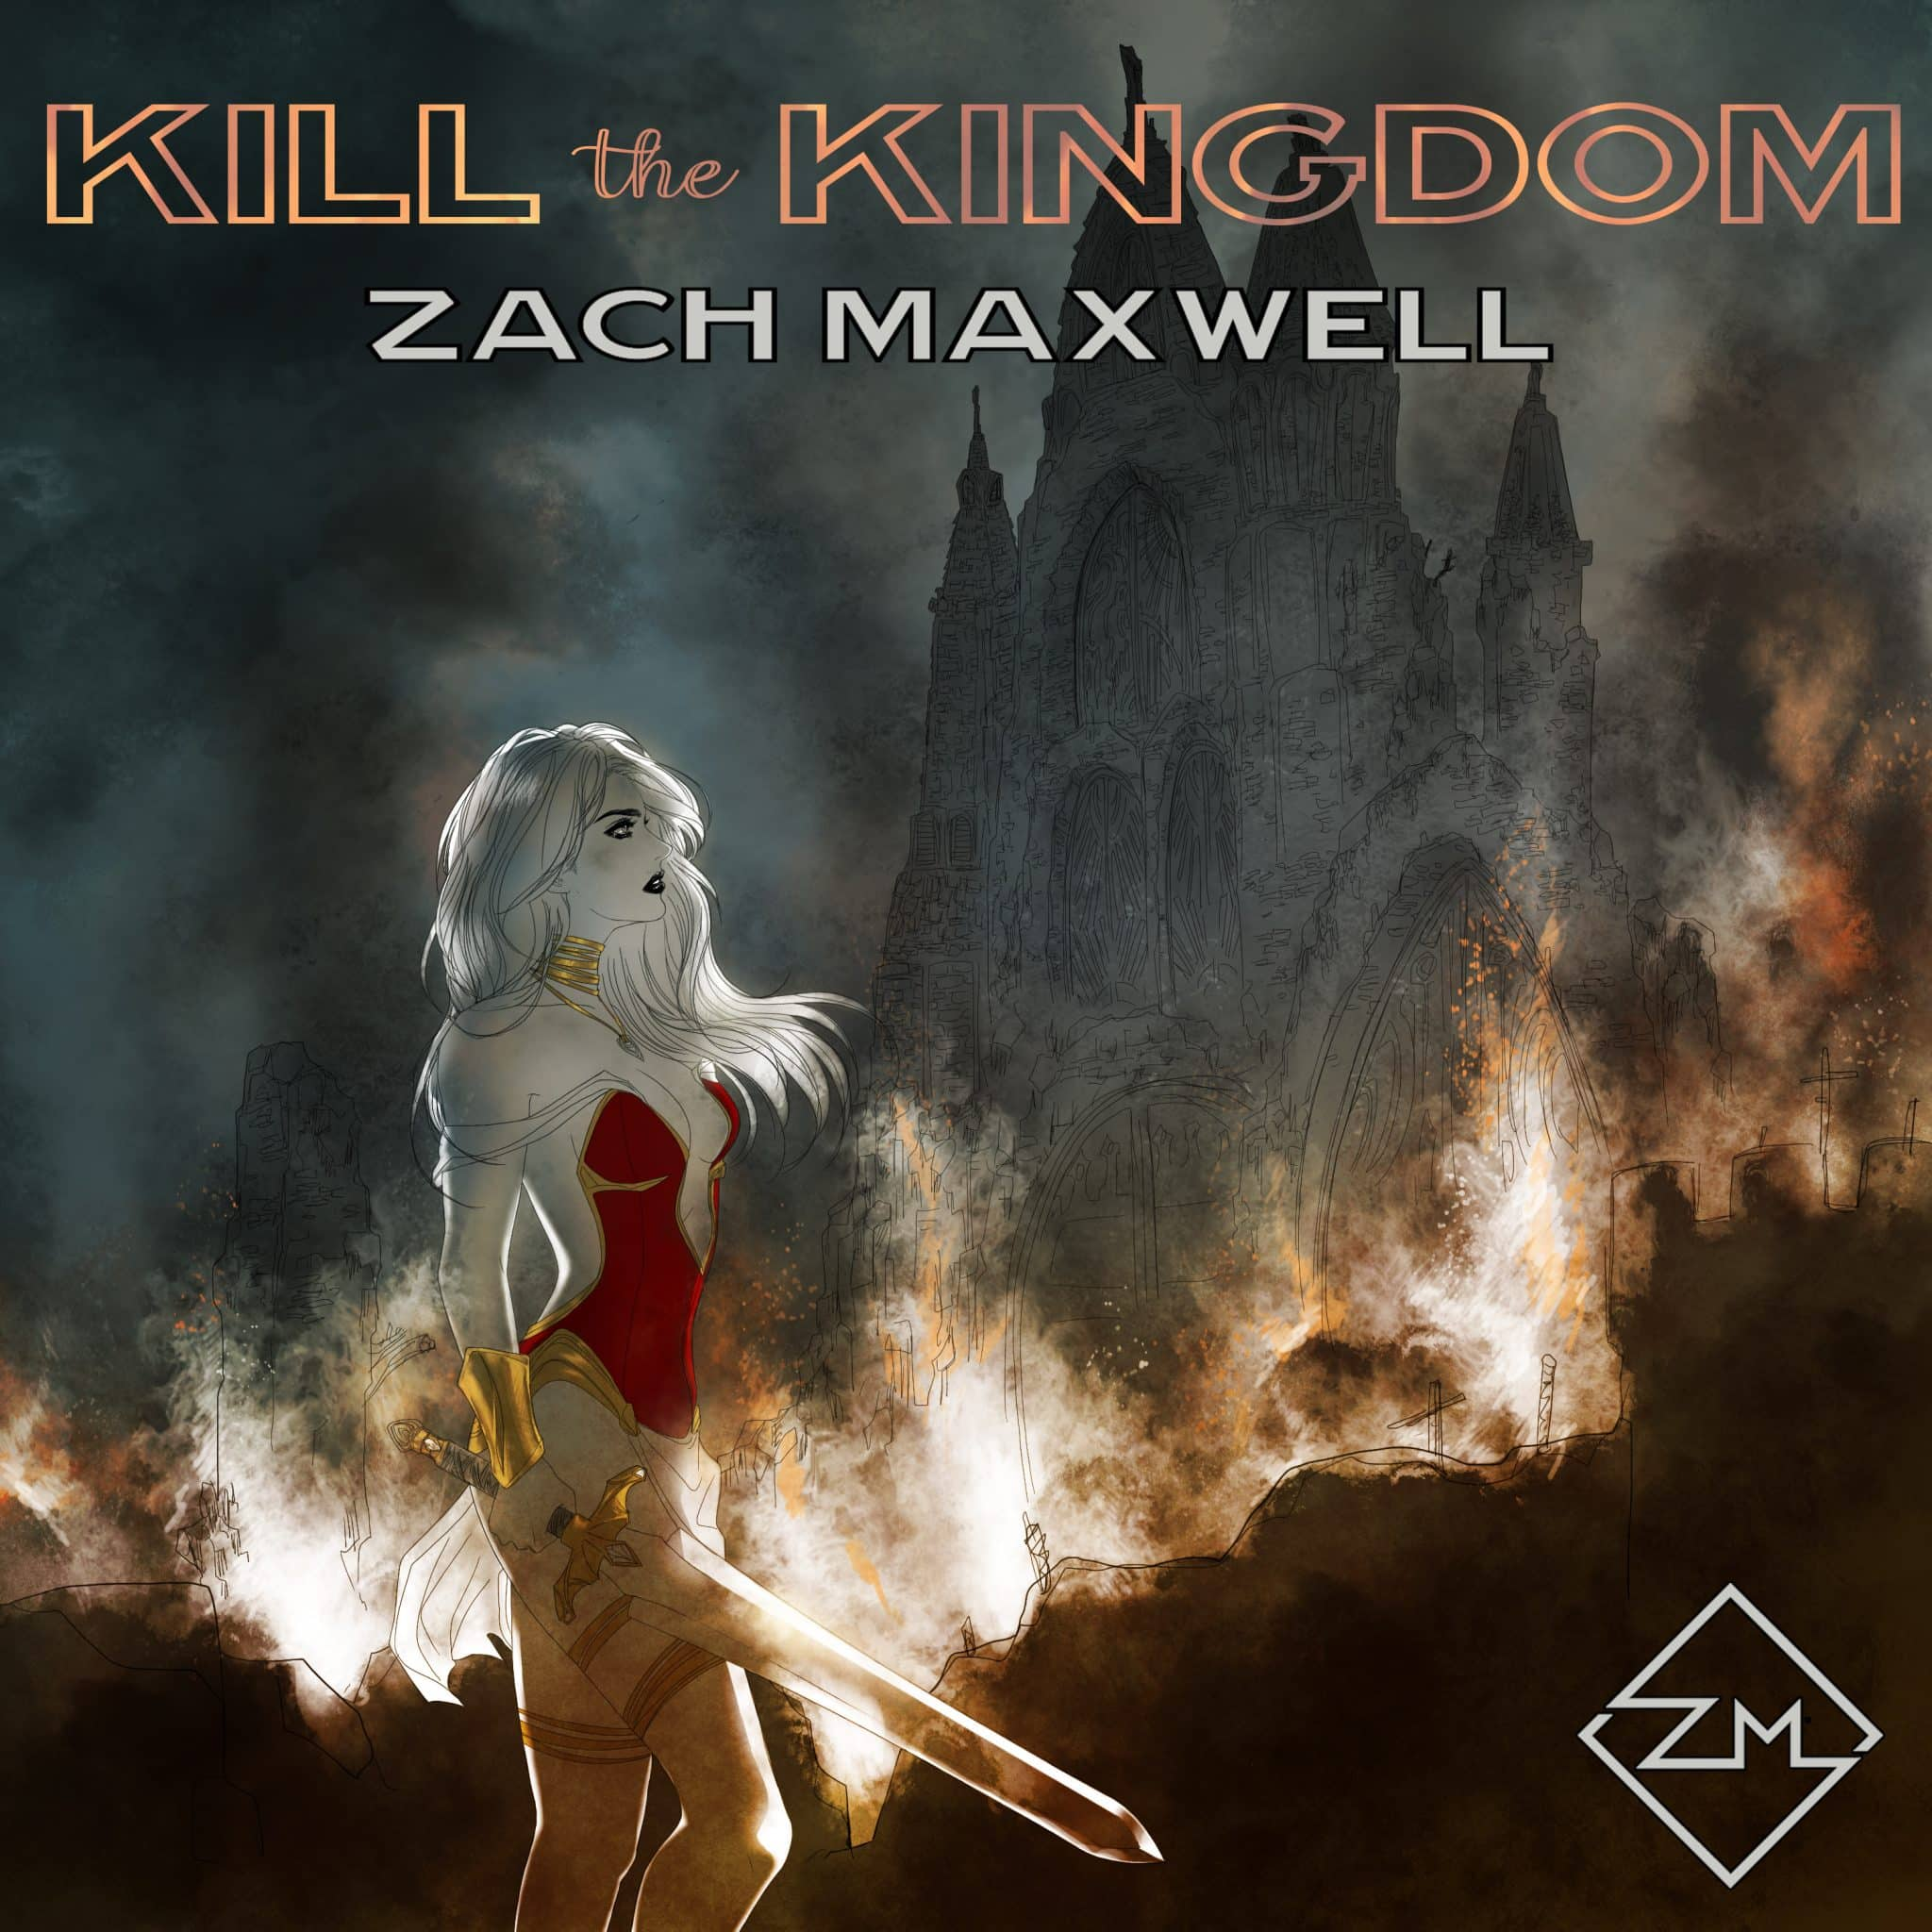 Zach Maxwell